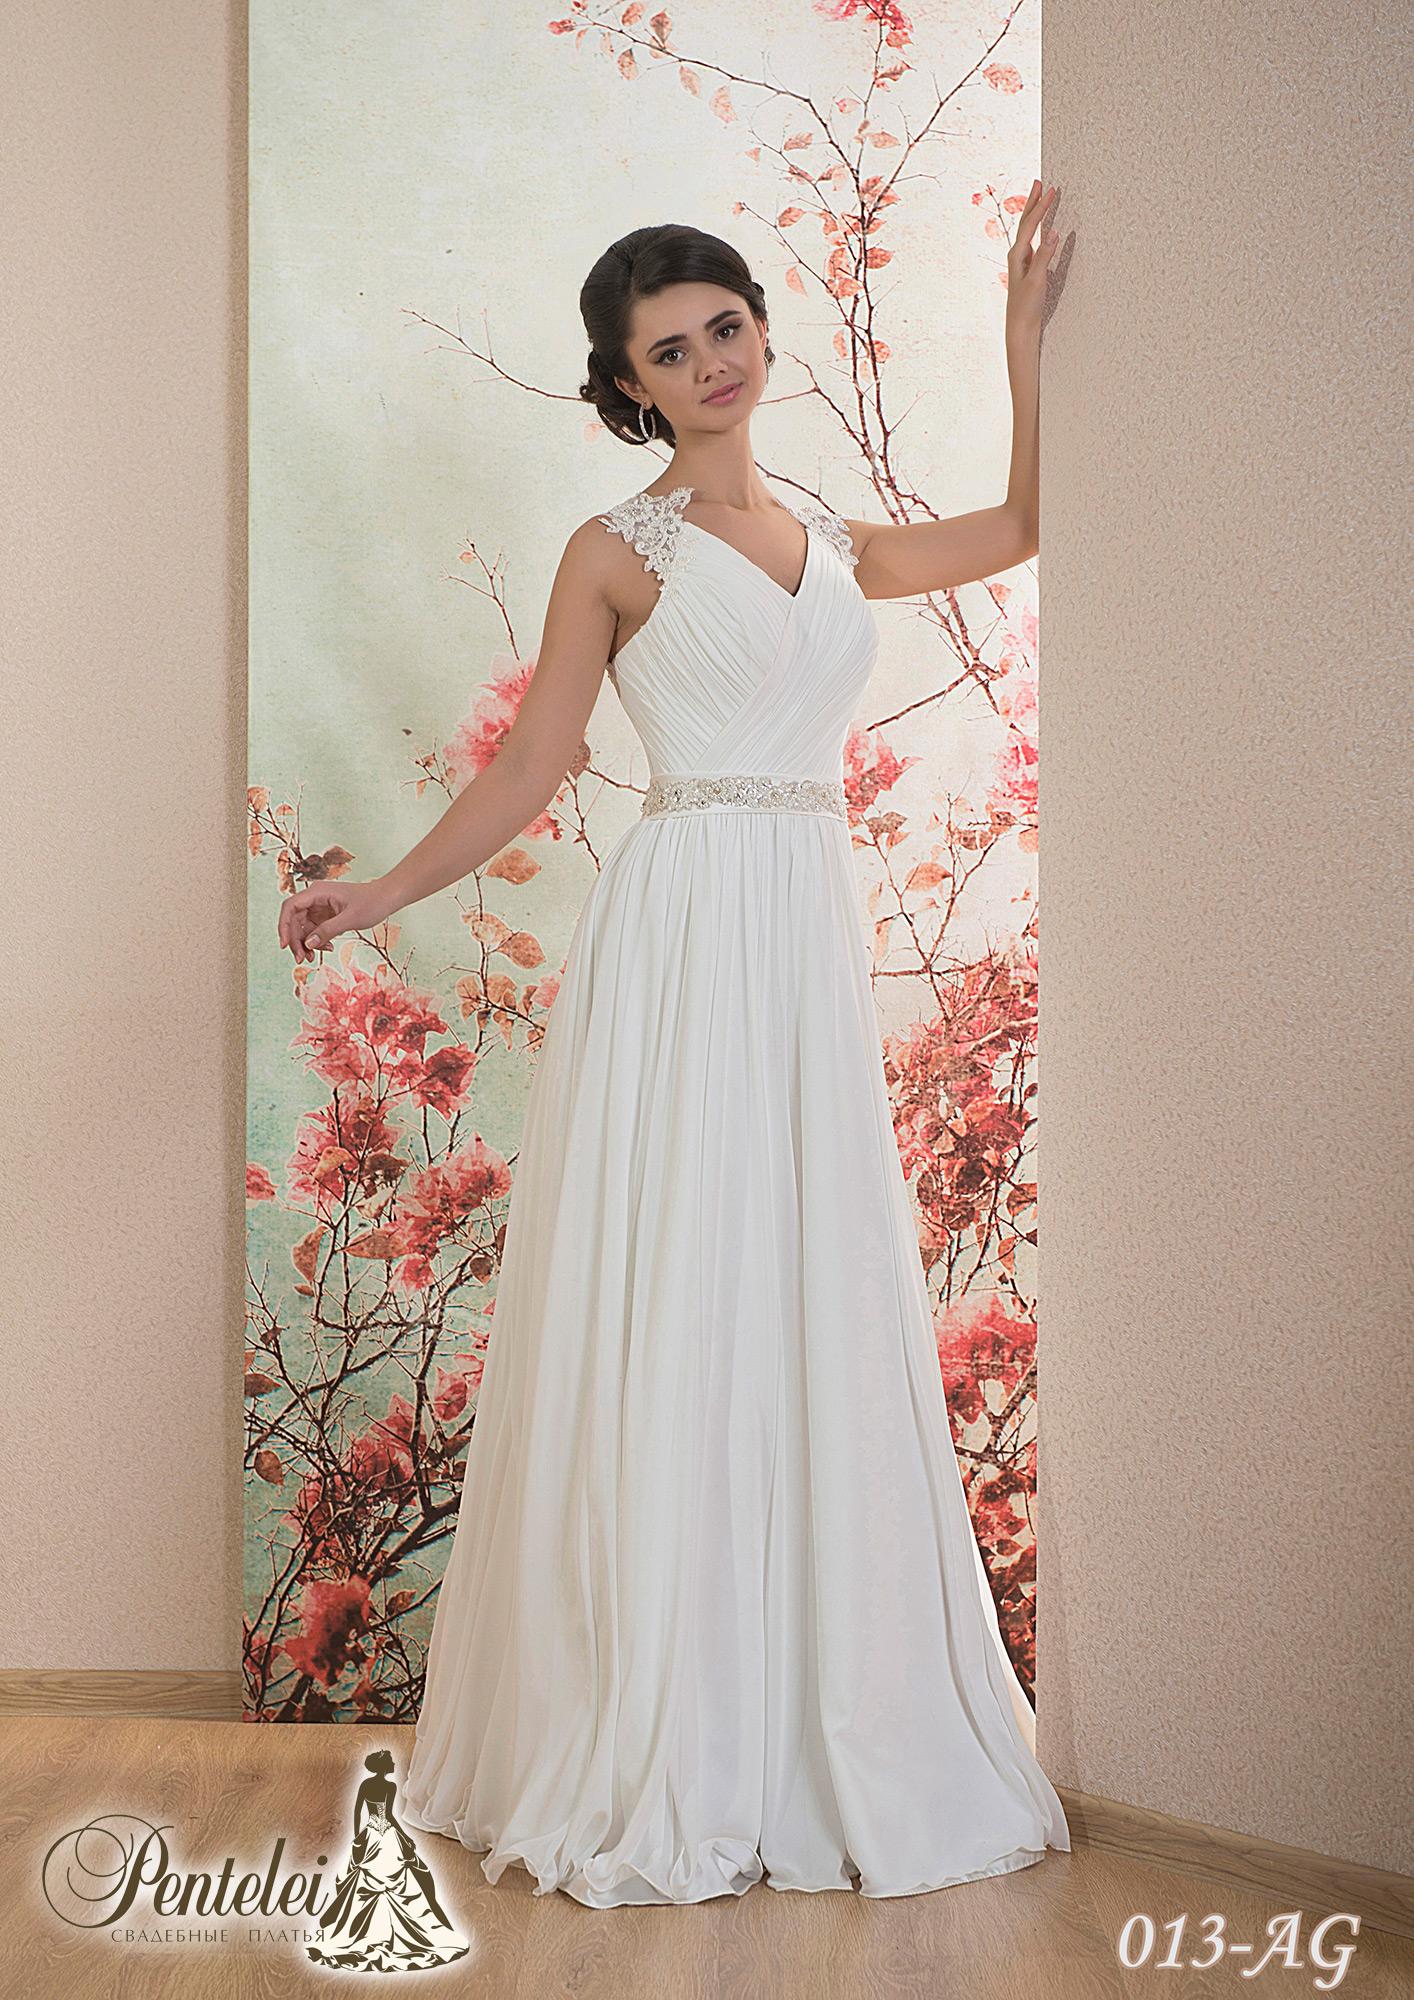 013-AG | Cumpăra rochii de mireasă en-gros de Pentelei